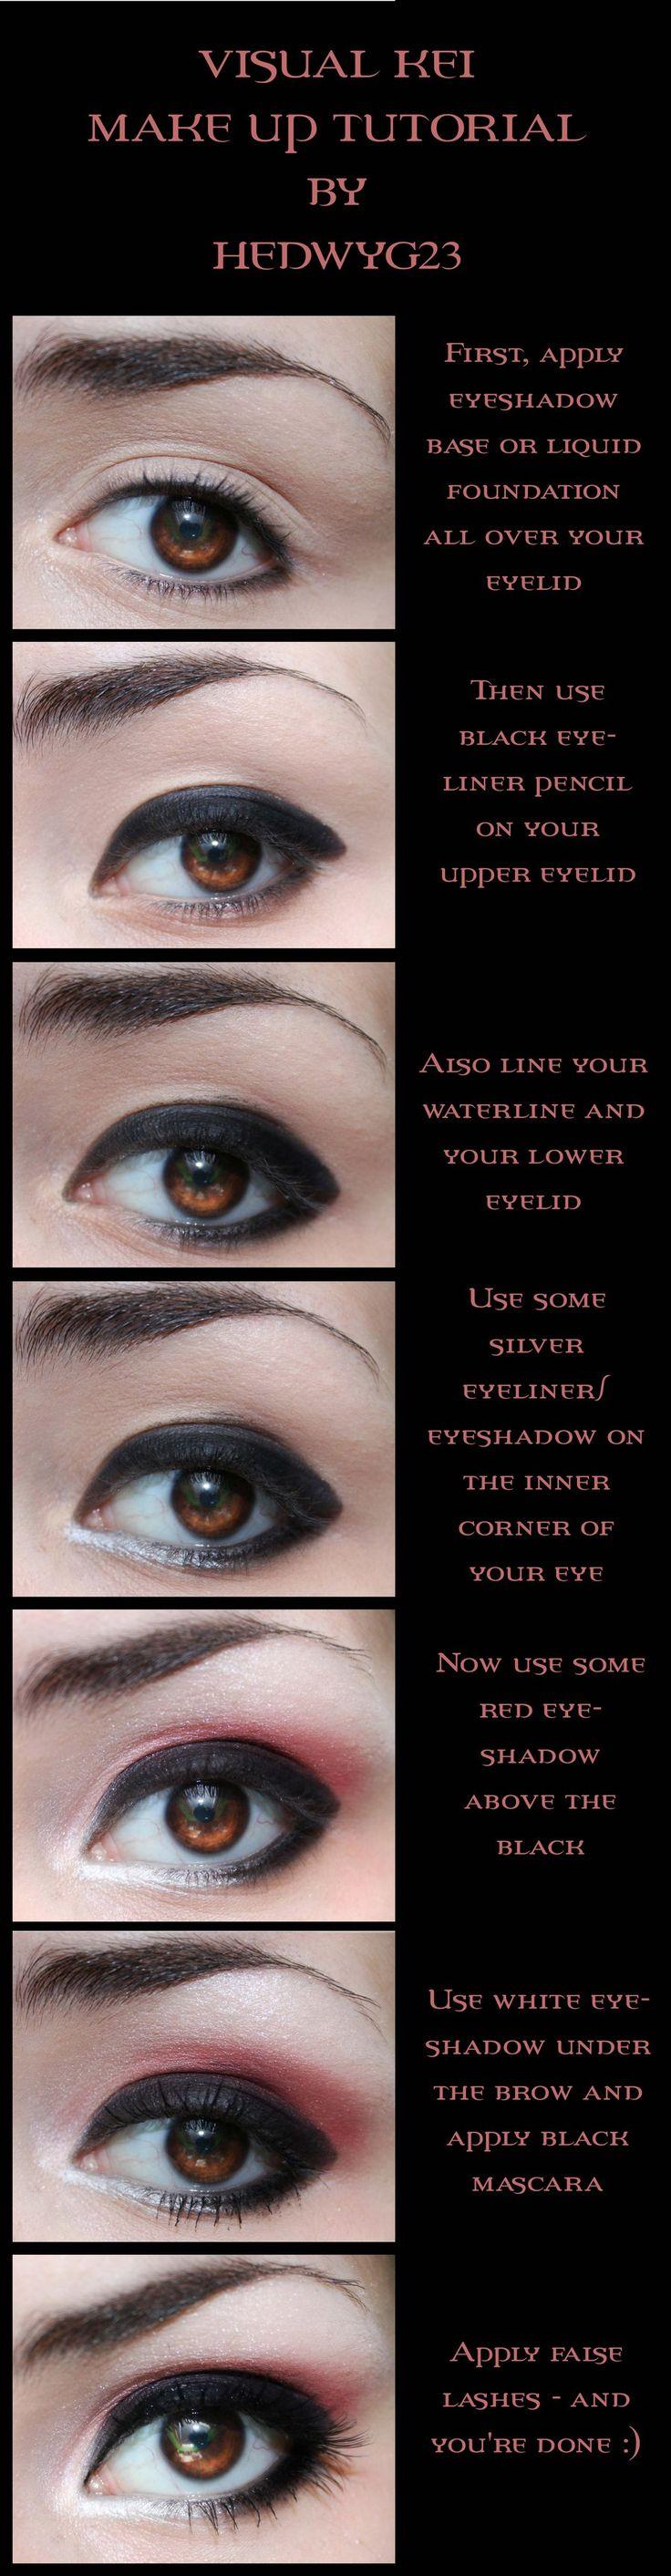 """Visual kei"" eye make up tutorial by Hedwyg23."